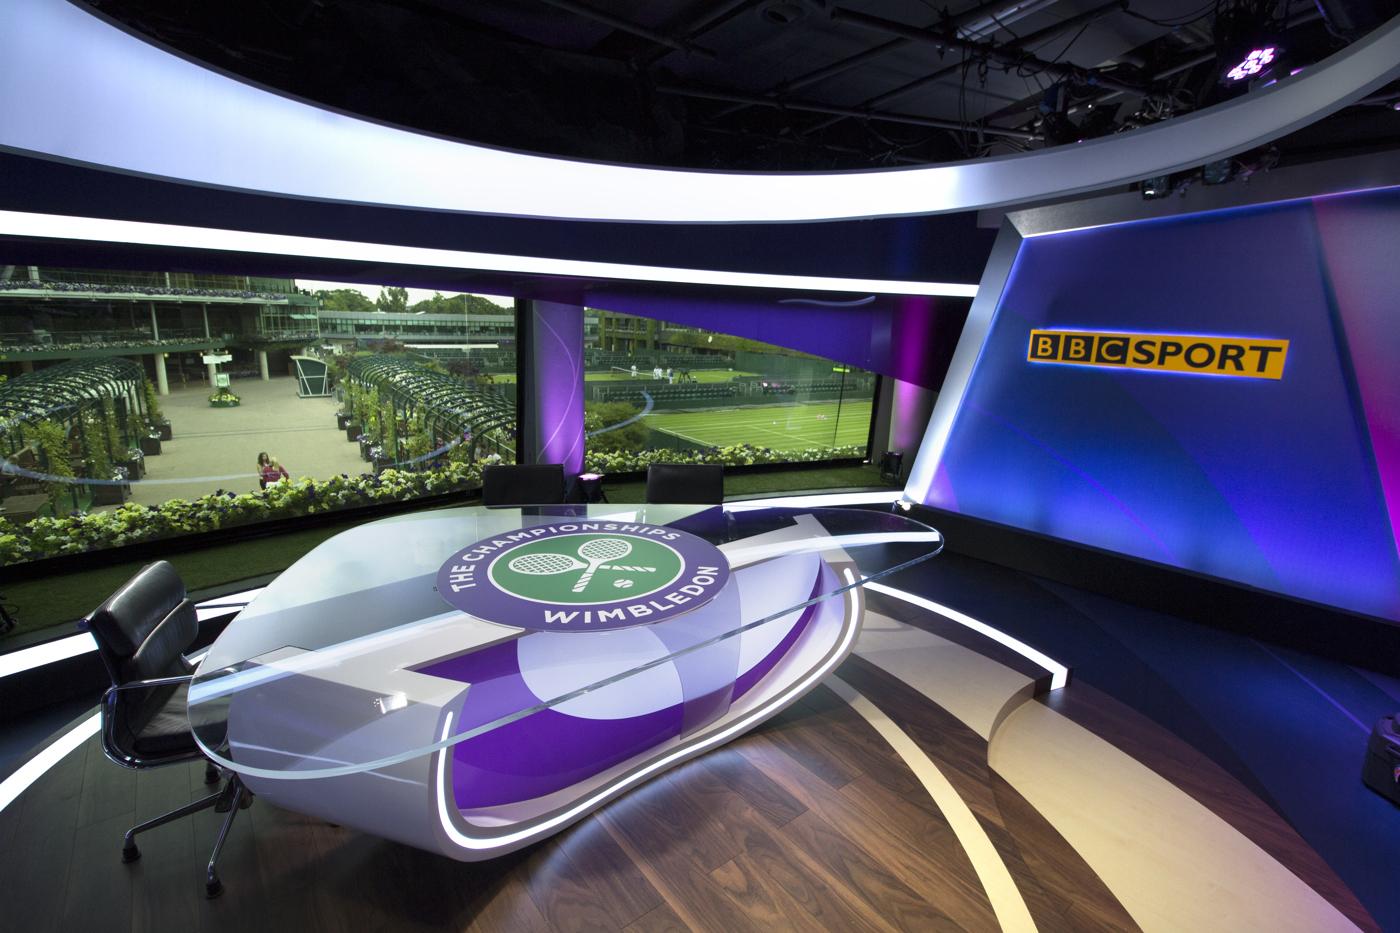 ncs_bbc-wimbledon-tv-studio-studiobound_0002